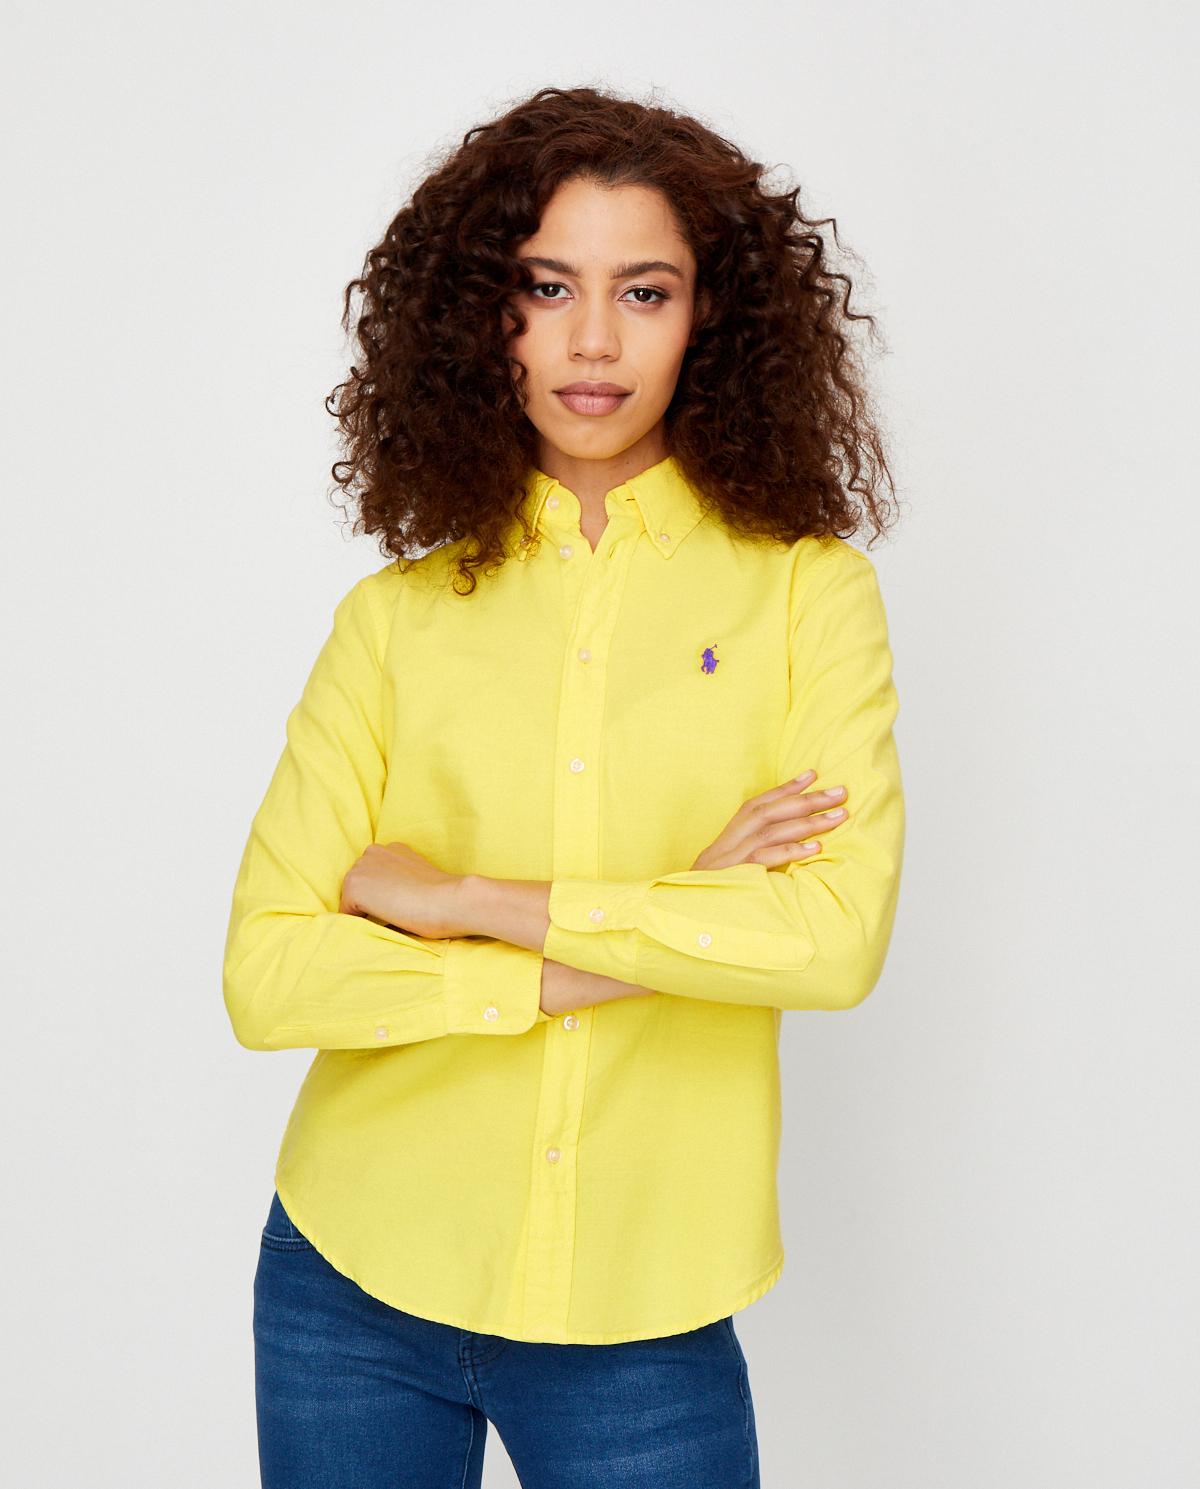 Damska żółta koszula z bawełny Relaxed Fit Polo Ralph Lauren 211780679003